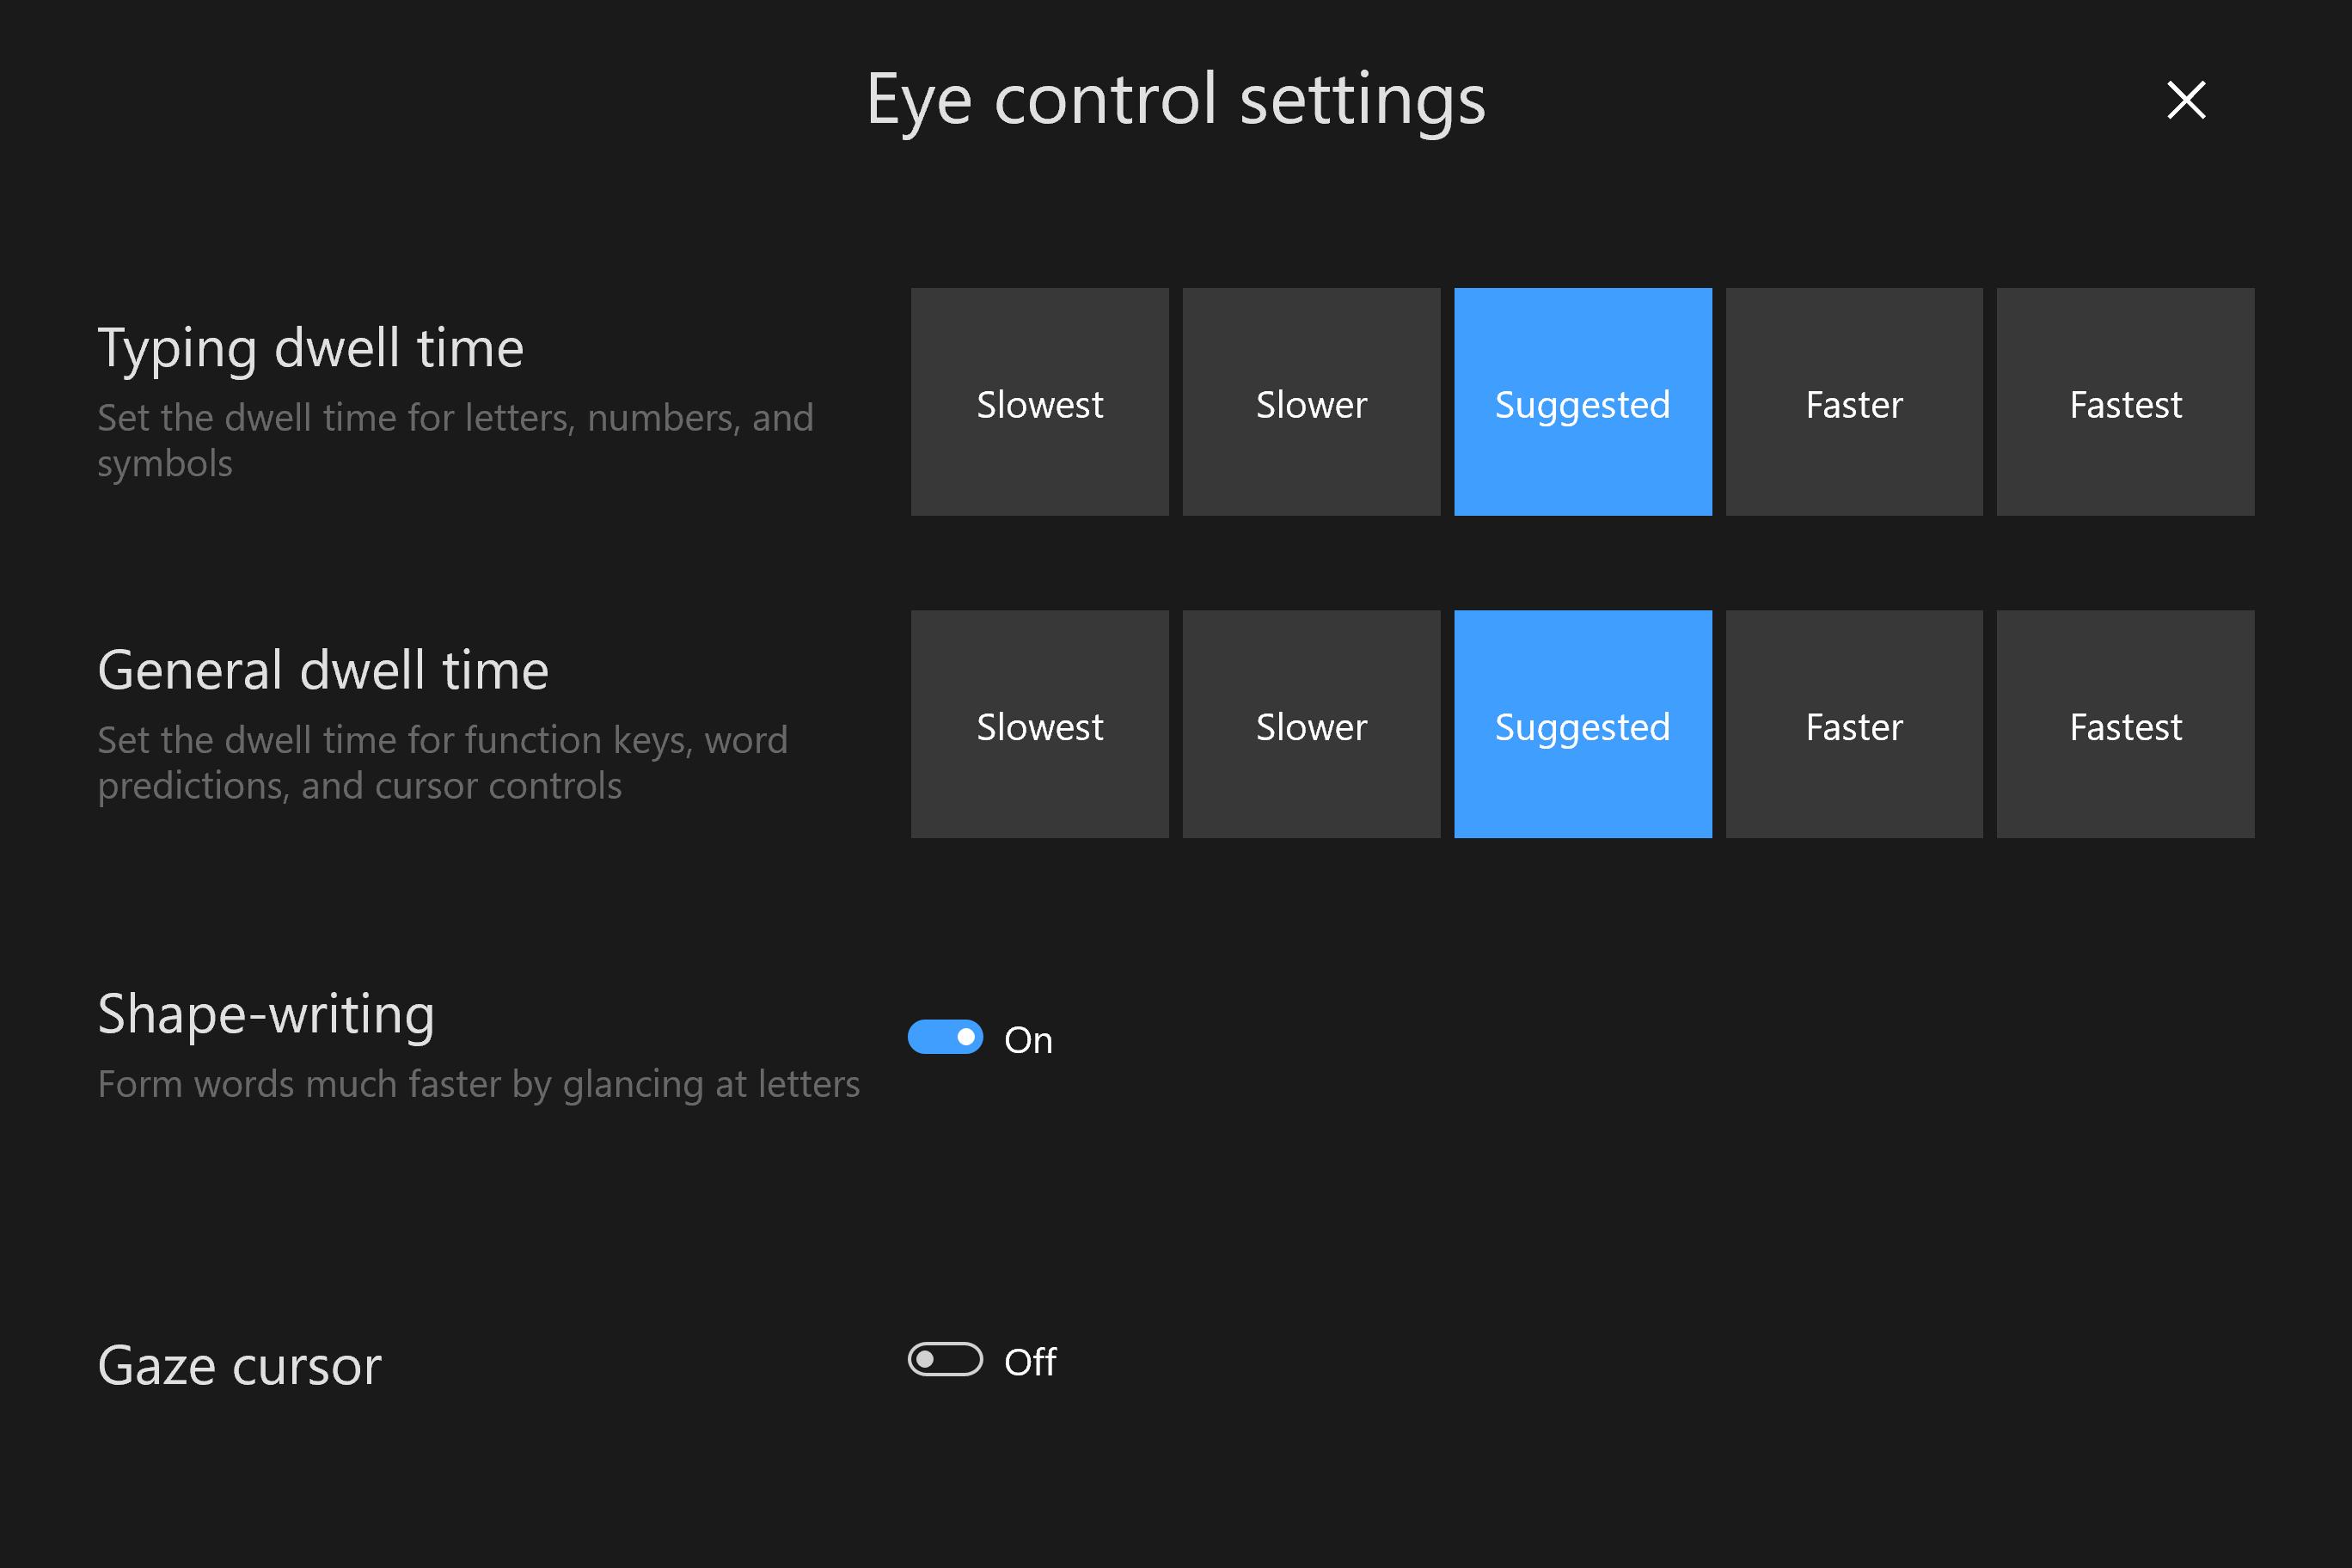 Eye Control settings fn page